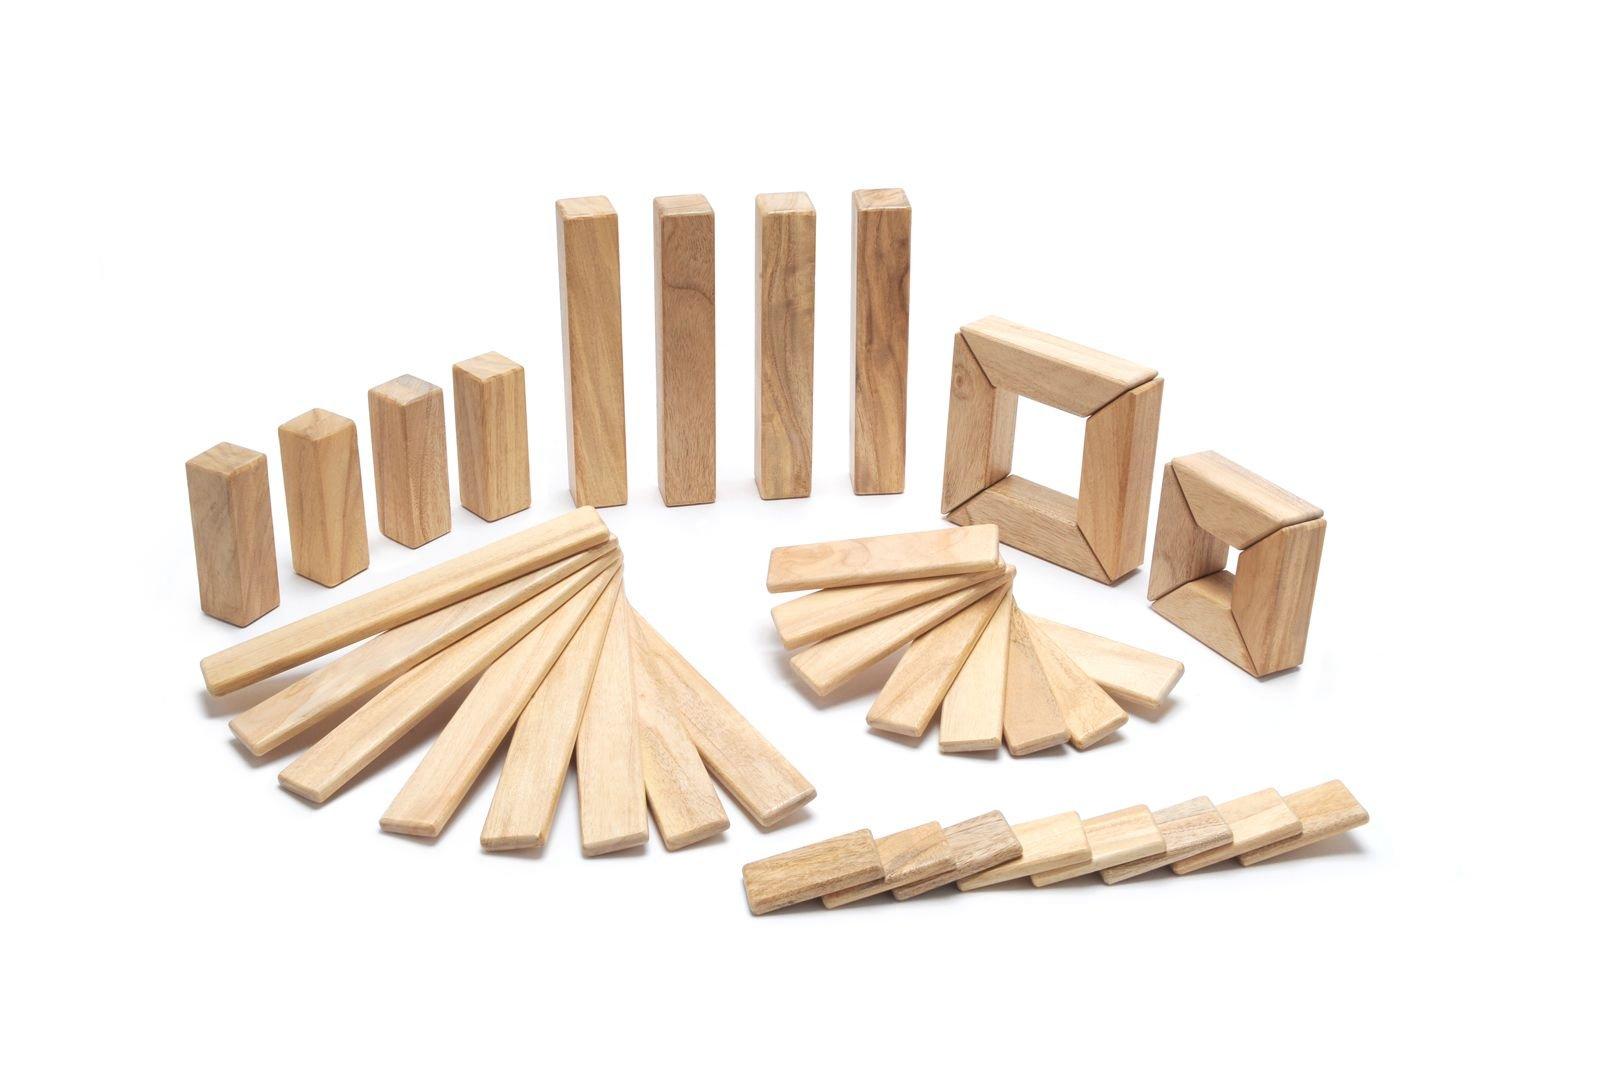 40 Piece Tegu Explorer Magnetic Wooden Block Set, Natural